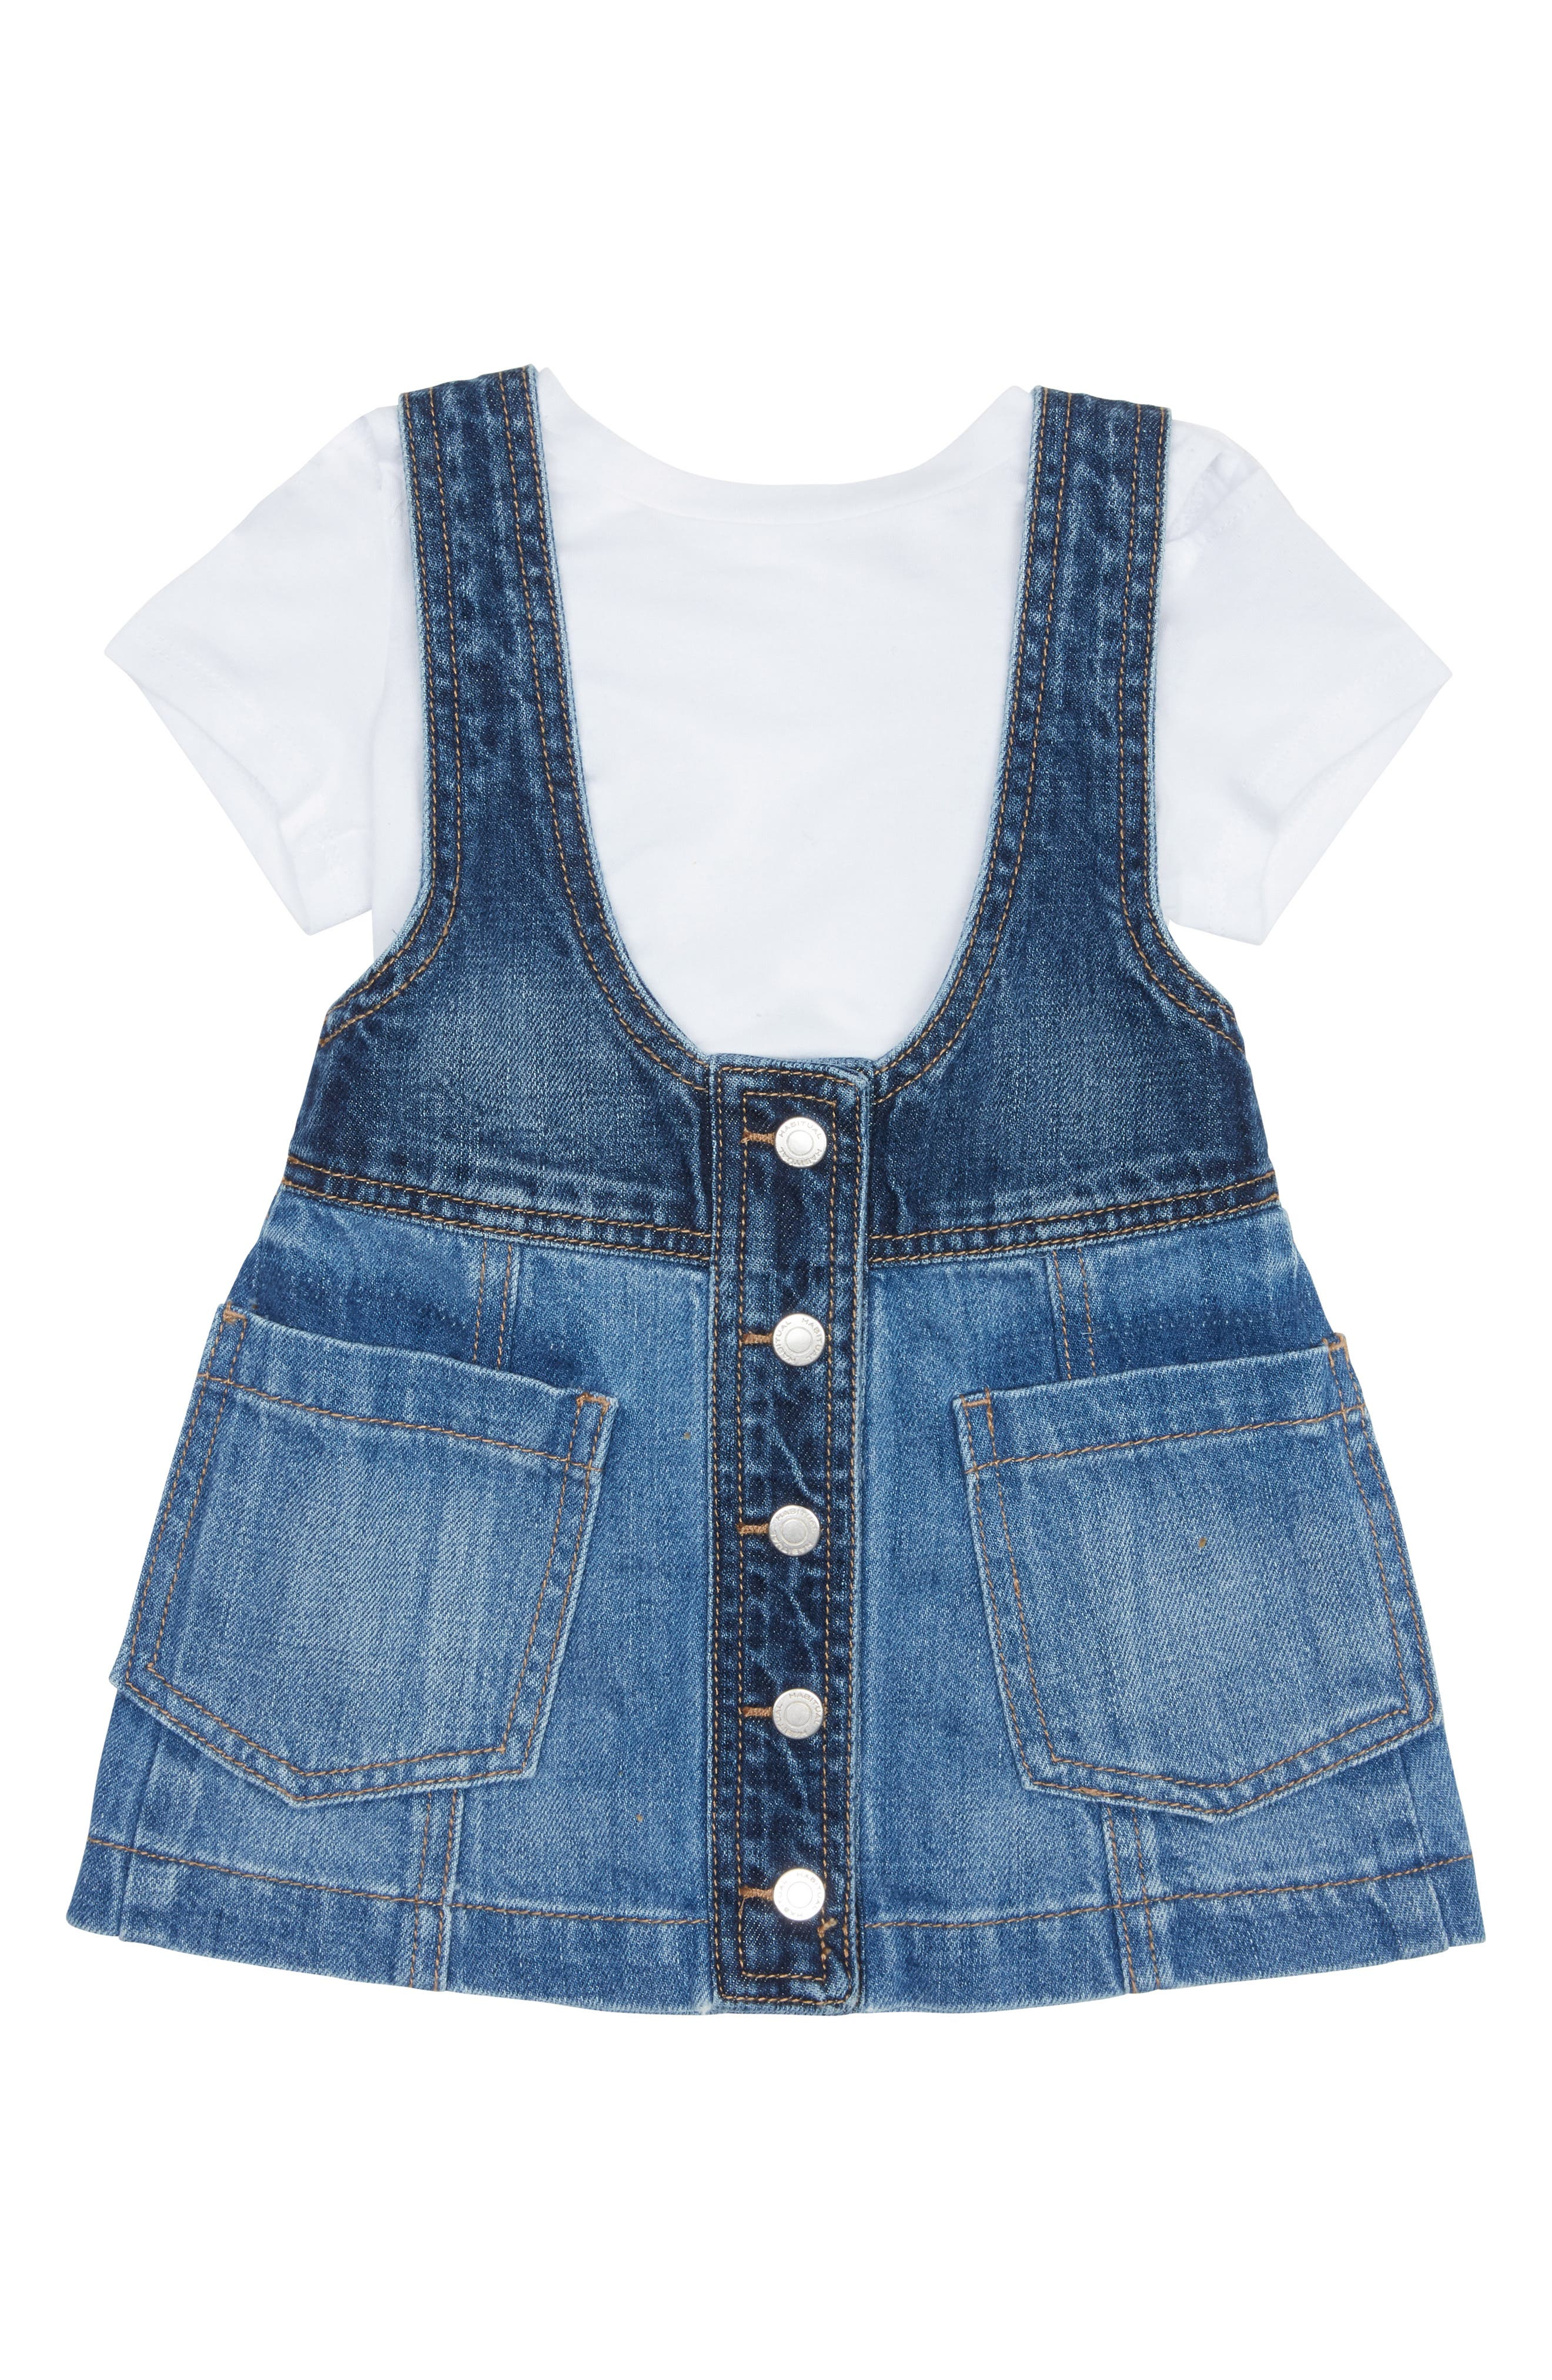 Toddler Girls Habitual Denim Jumper Dress  Tee Set